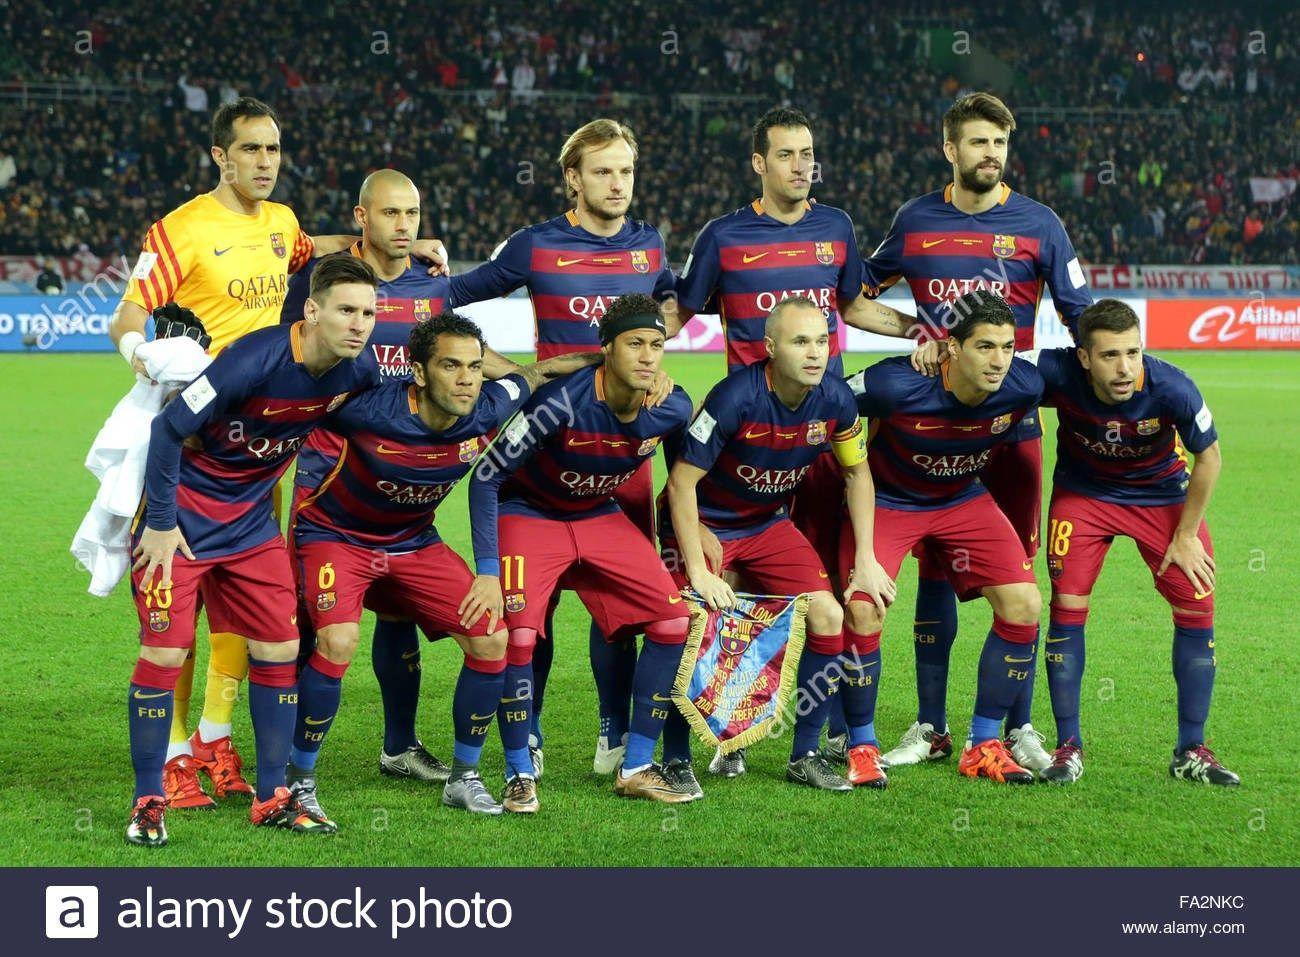 fc barcelona team promotion - photo #38